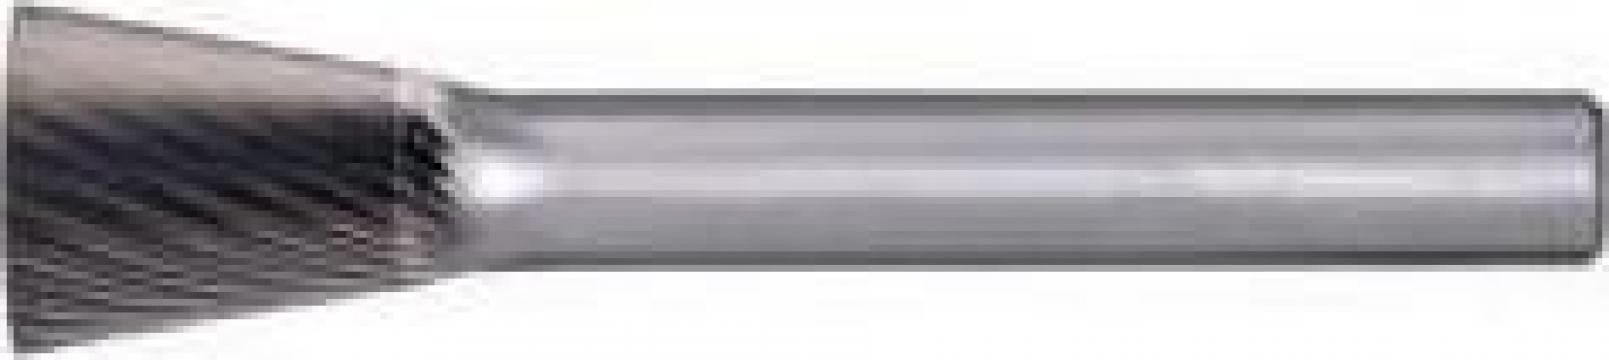 Freze biax PFERD HM, forma invers tronconica WKN de la Technic Trial Srl.